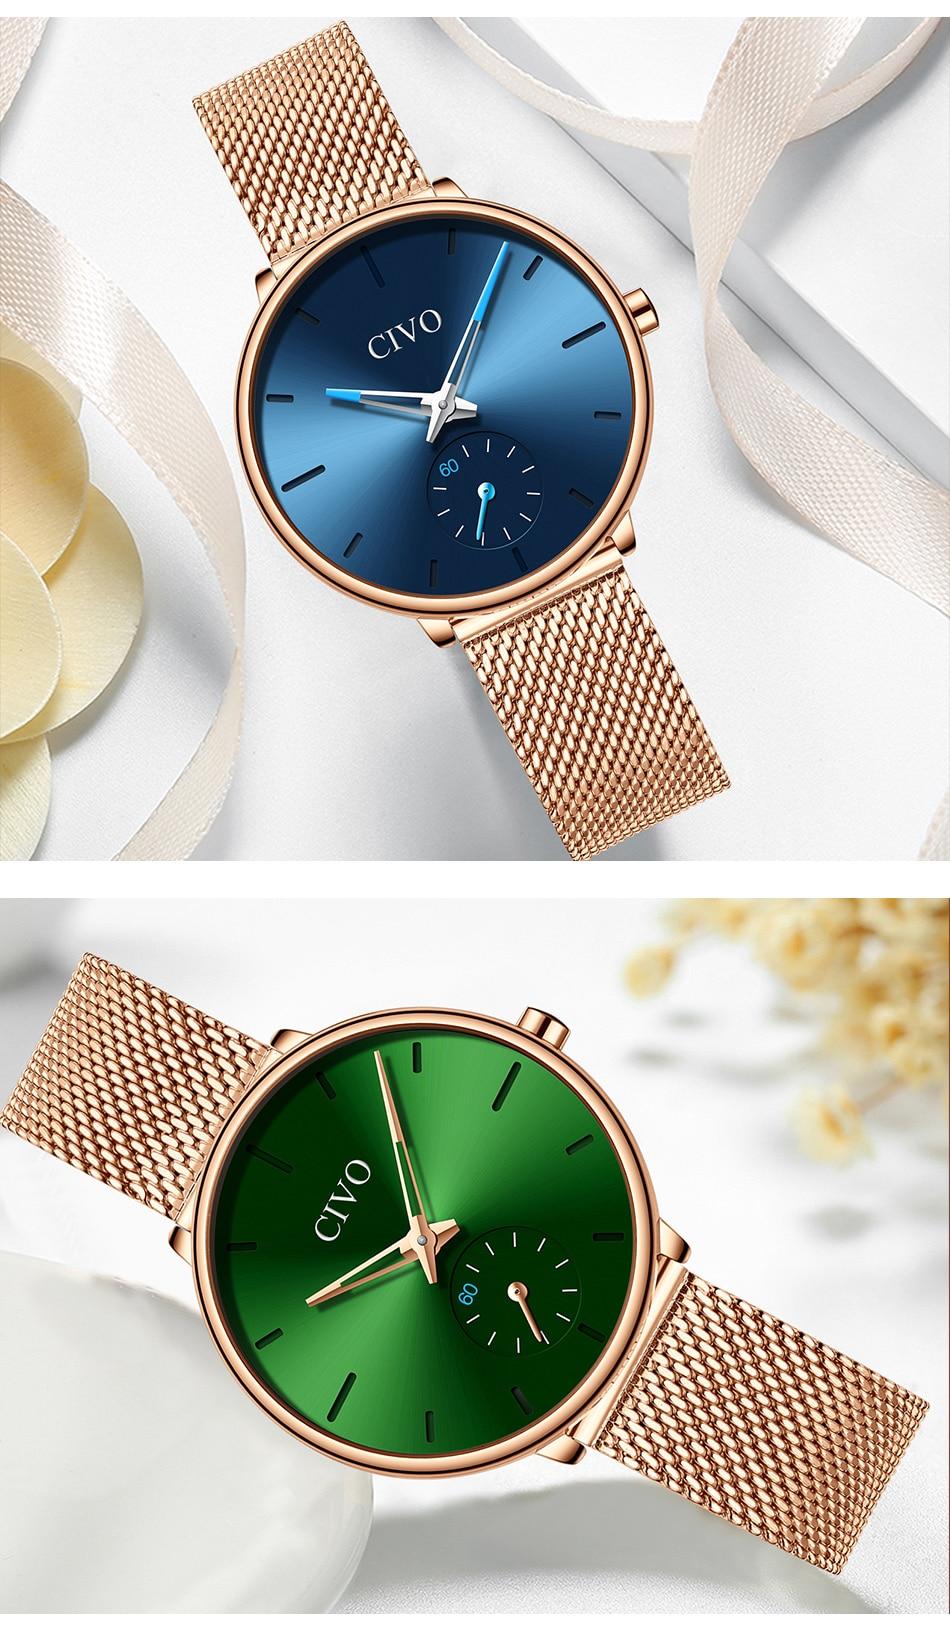 CIVO Luxury Casual Ladies Watch Waterproof Rose Gold Steel Mesh Quartz Watch Women Fashion Dress Watches Clock Relogio Feminino 12